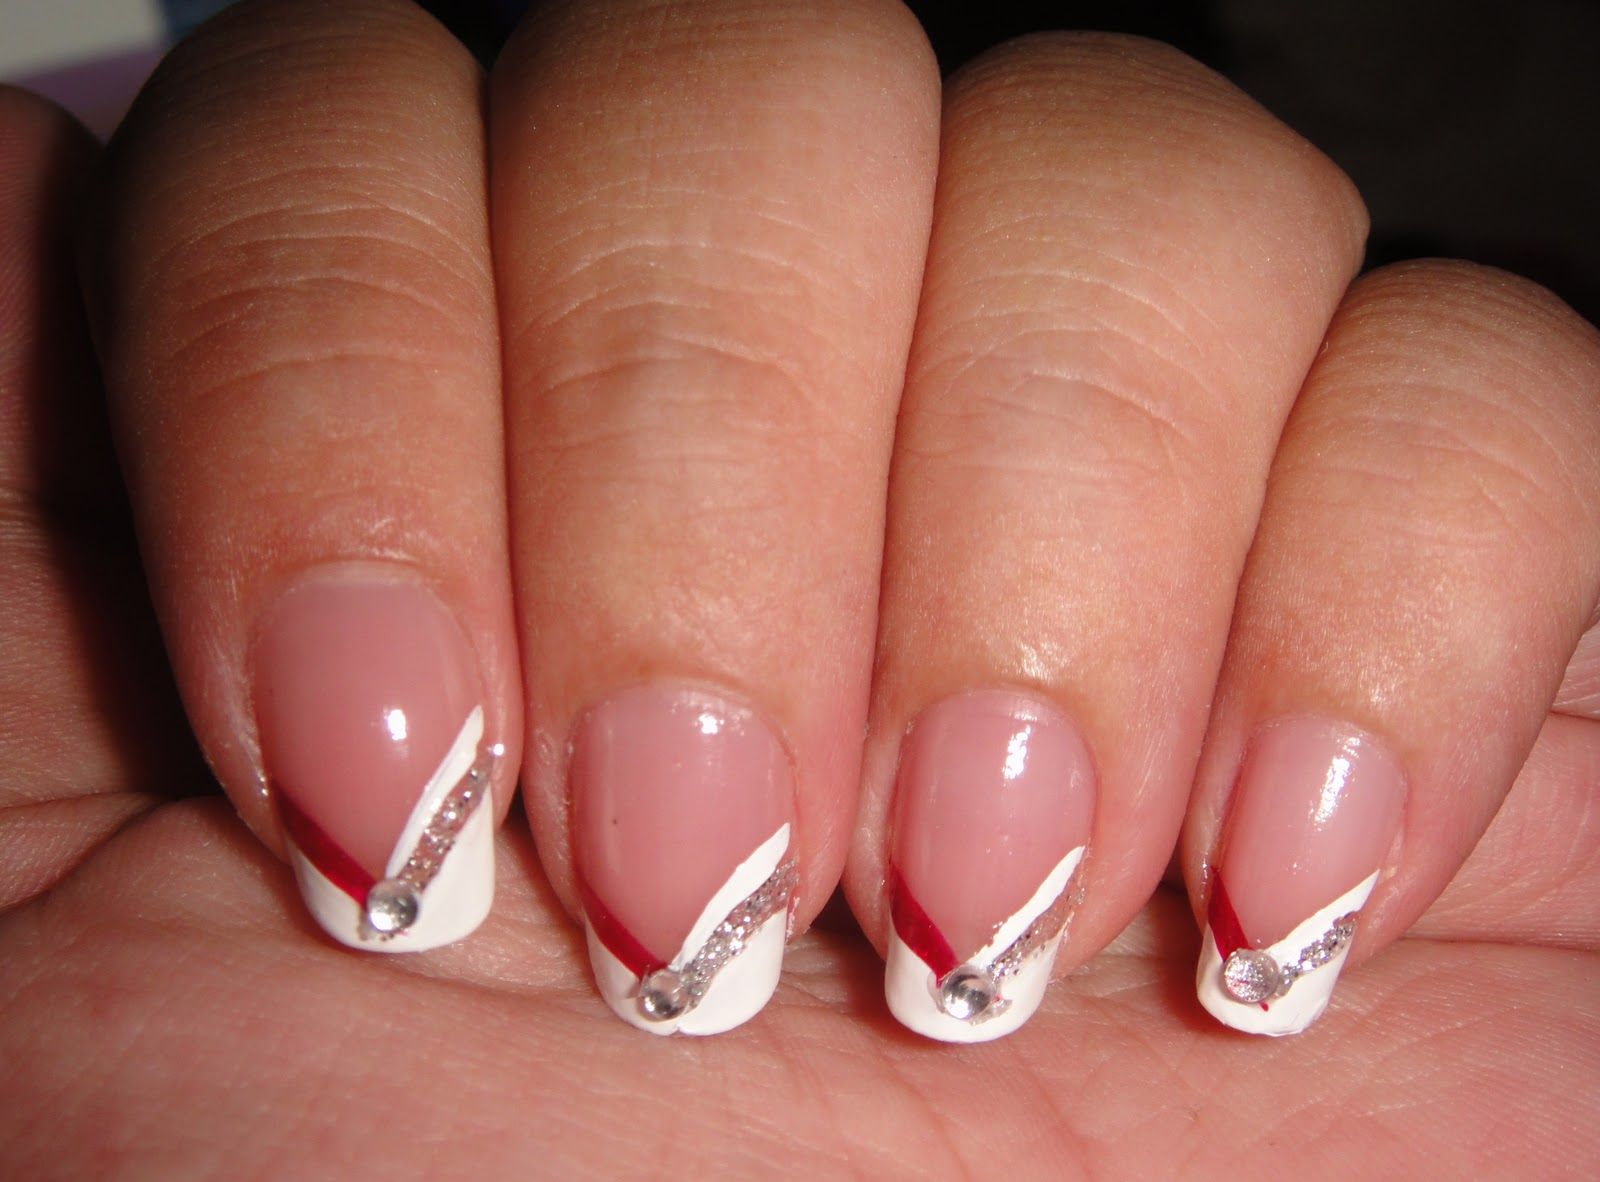 fall+nail+art+designs | ... Chevron French Plus Fall Nail ...